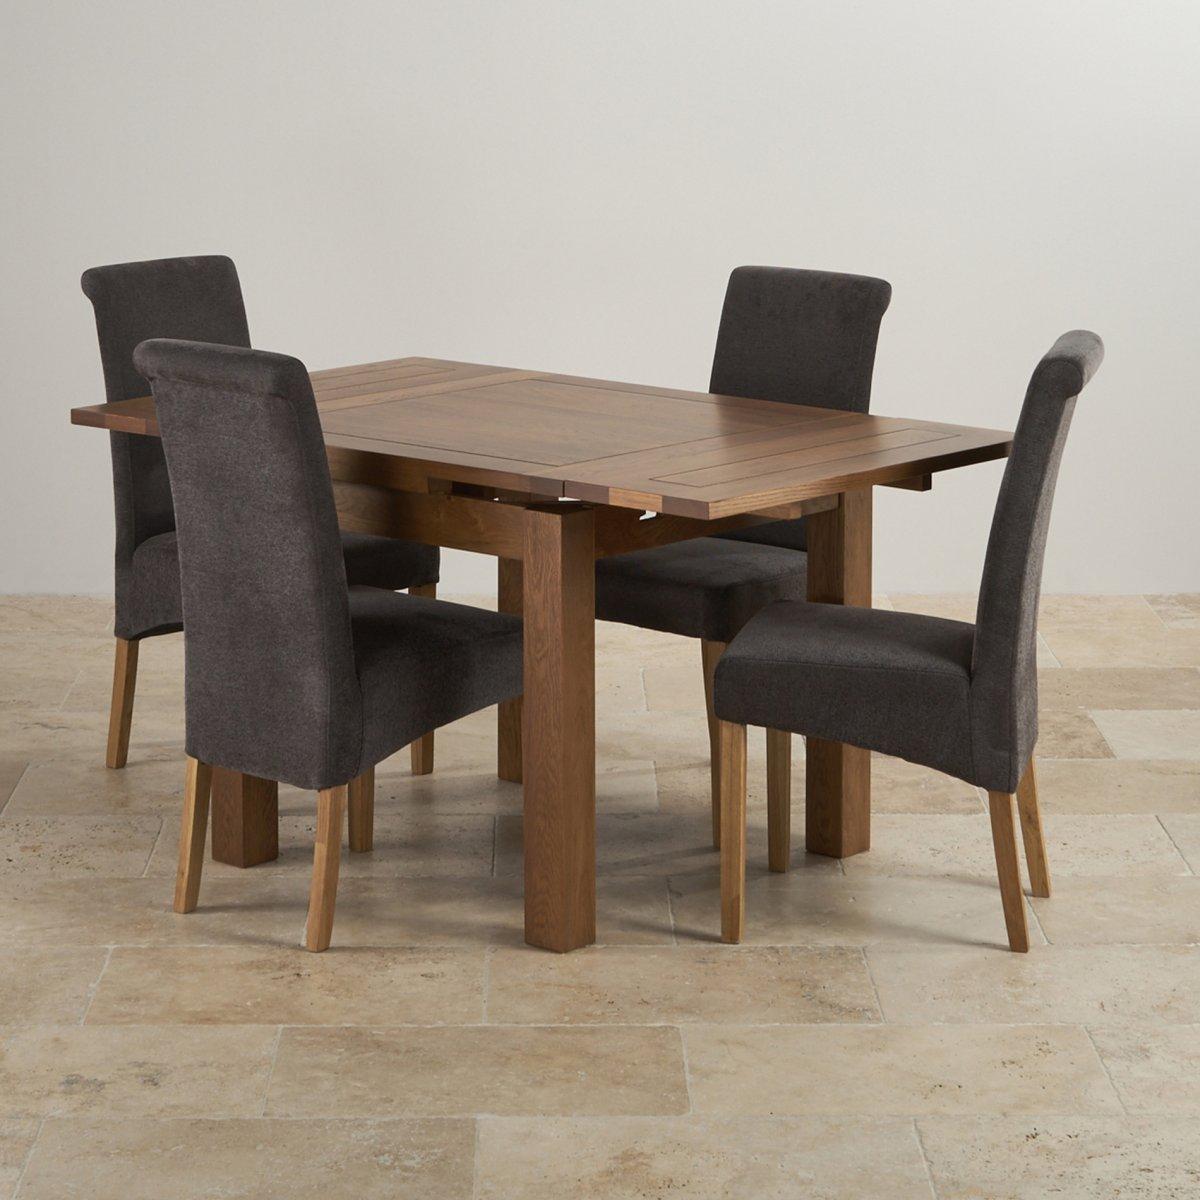 Oak Dining Table Set: Rustic Oak Dining Set: 3ft Extending Table + 4 Scroll Back